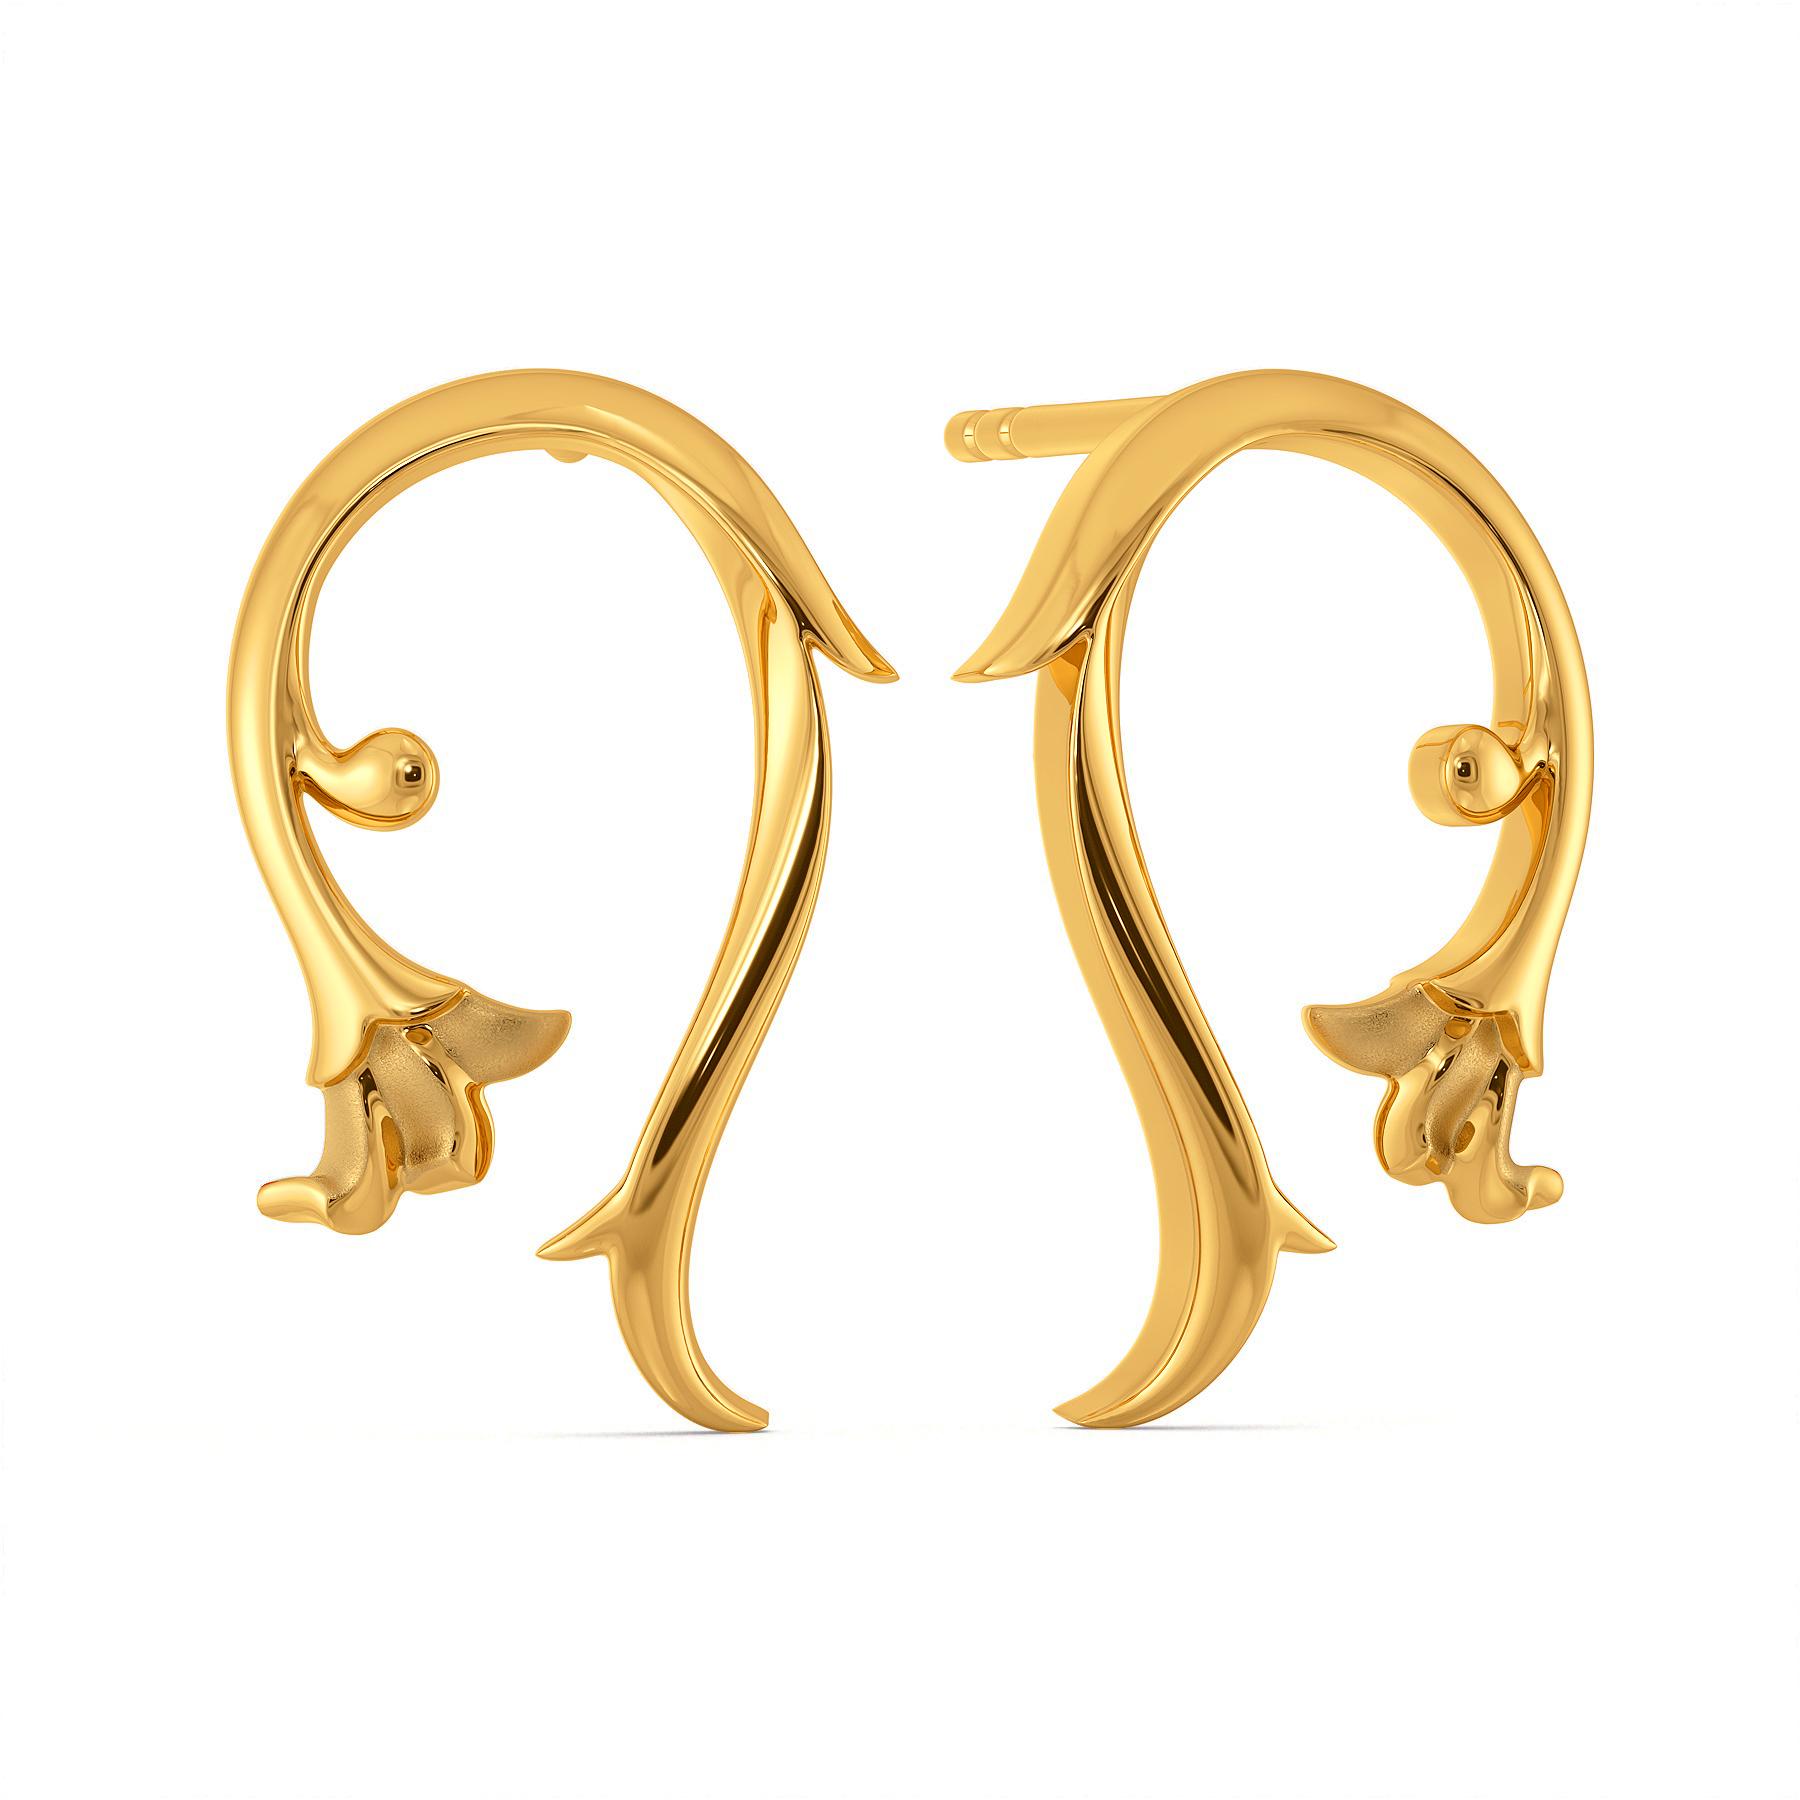 Trailing Vines Gold Earrings